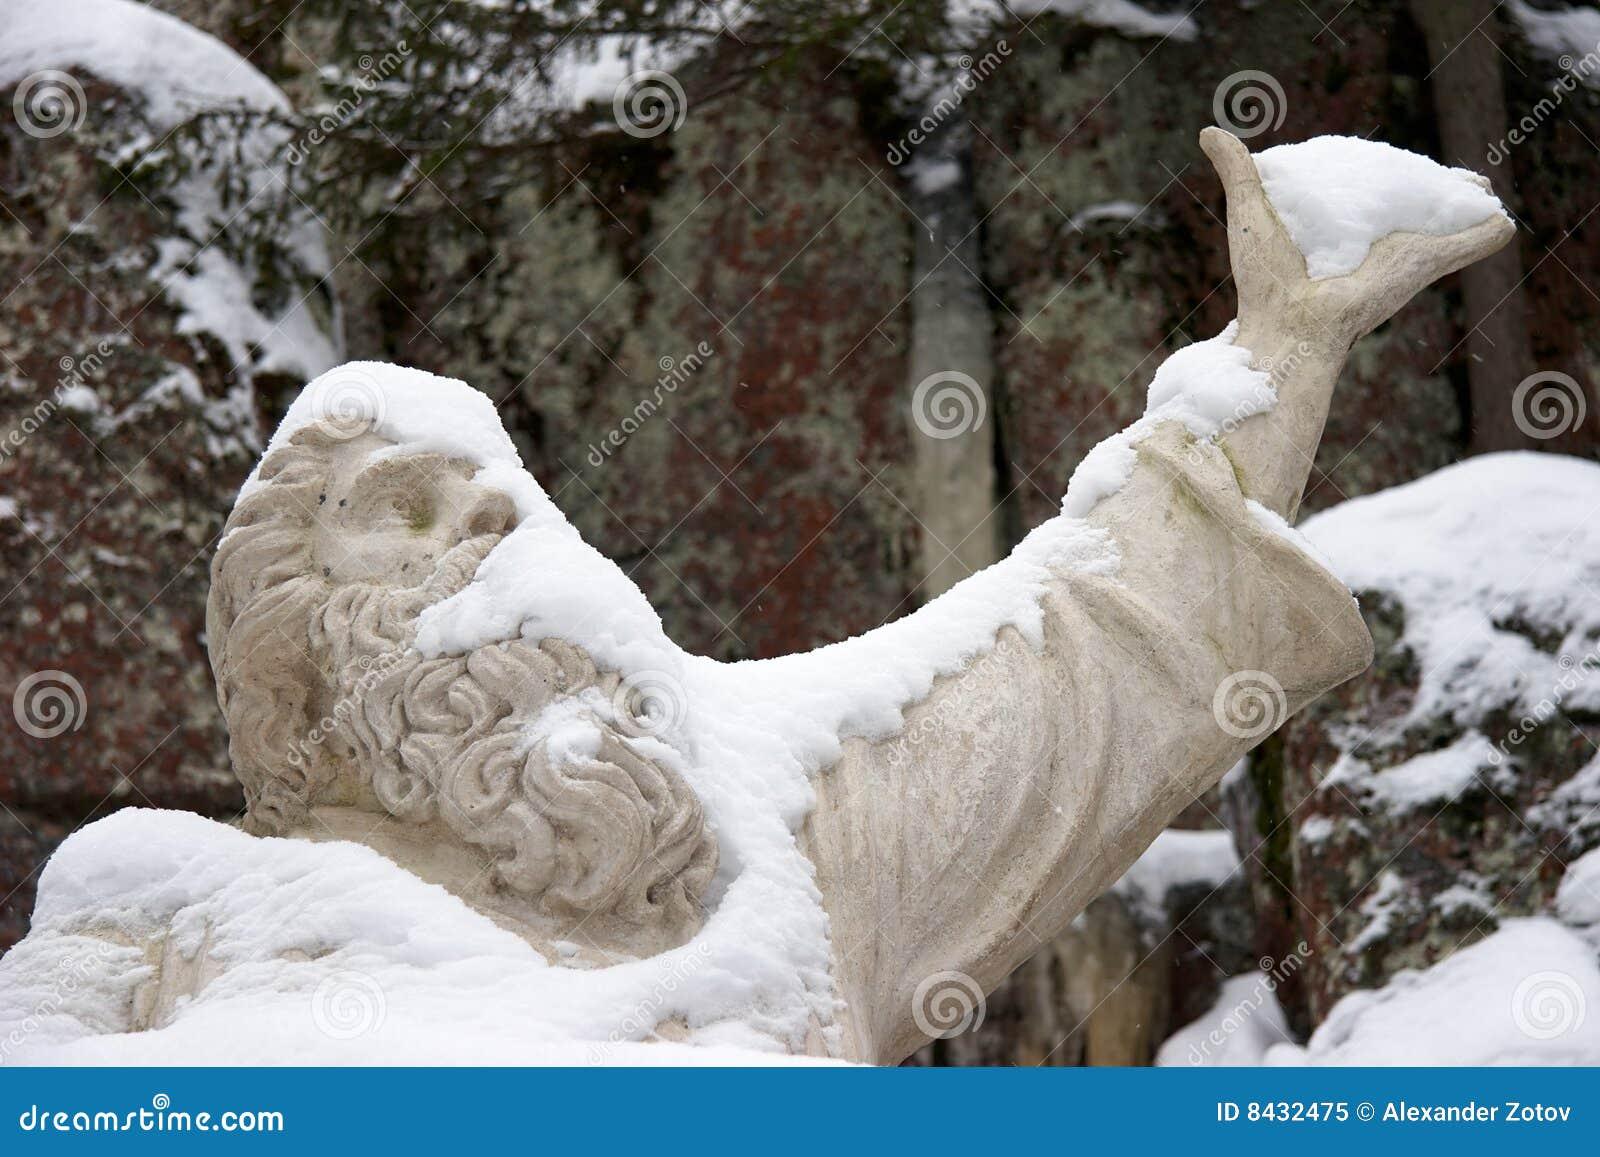 Statue of Vainamoinen, the hero in Kalevala epic